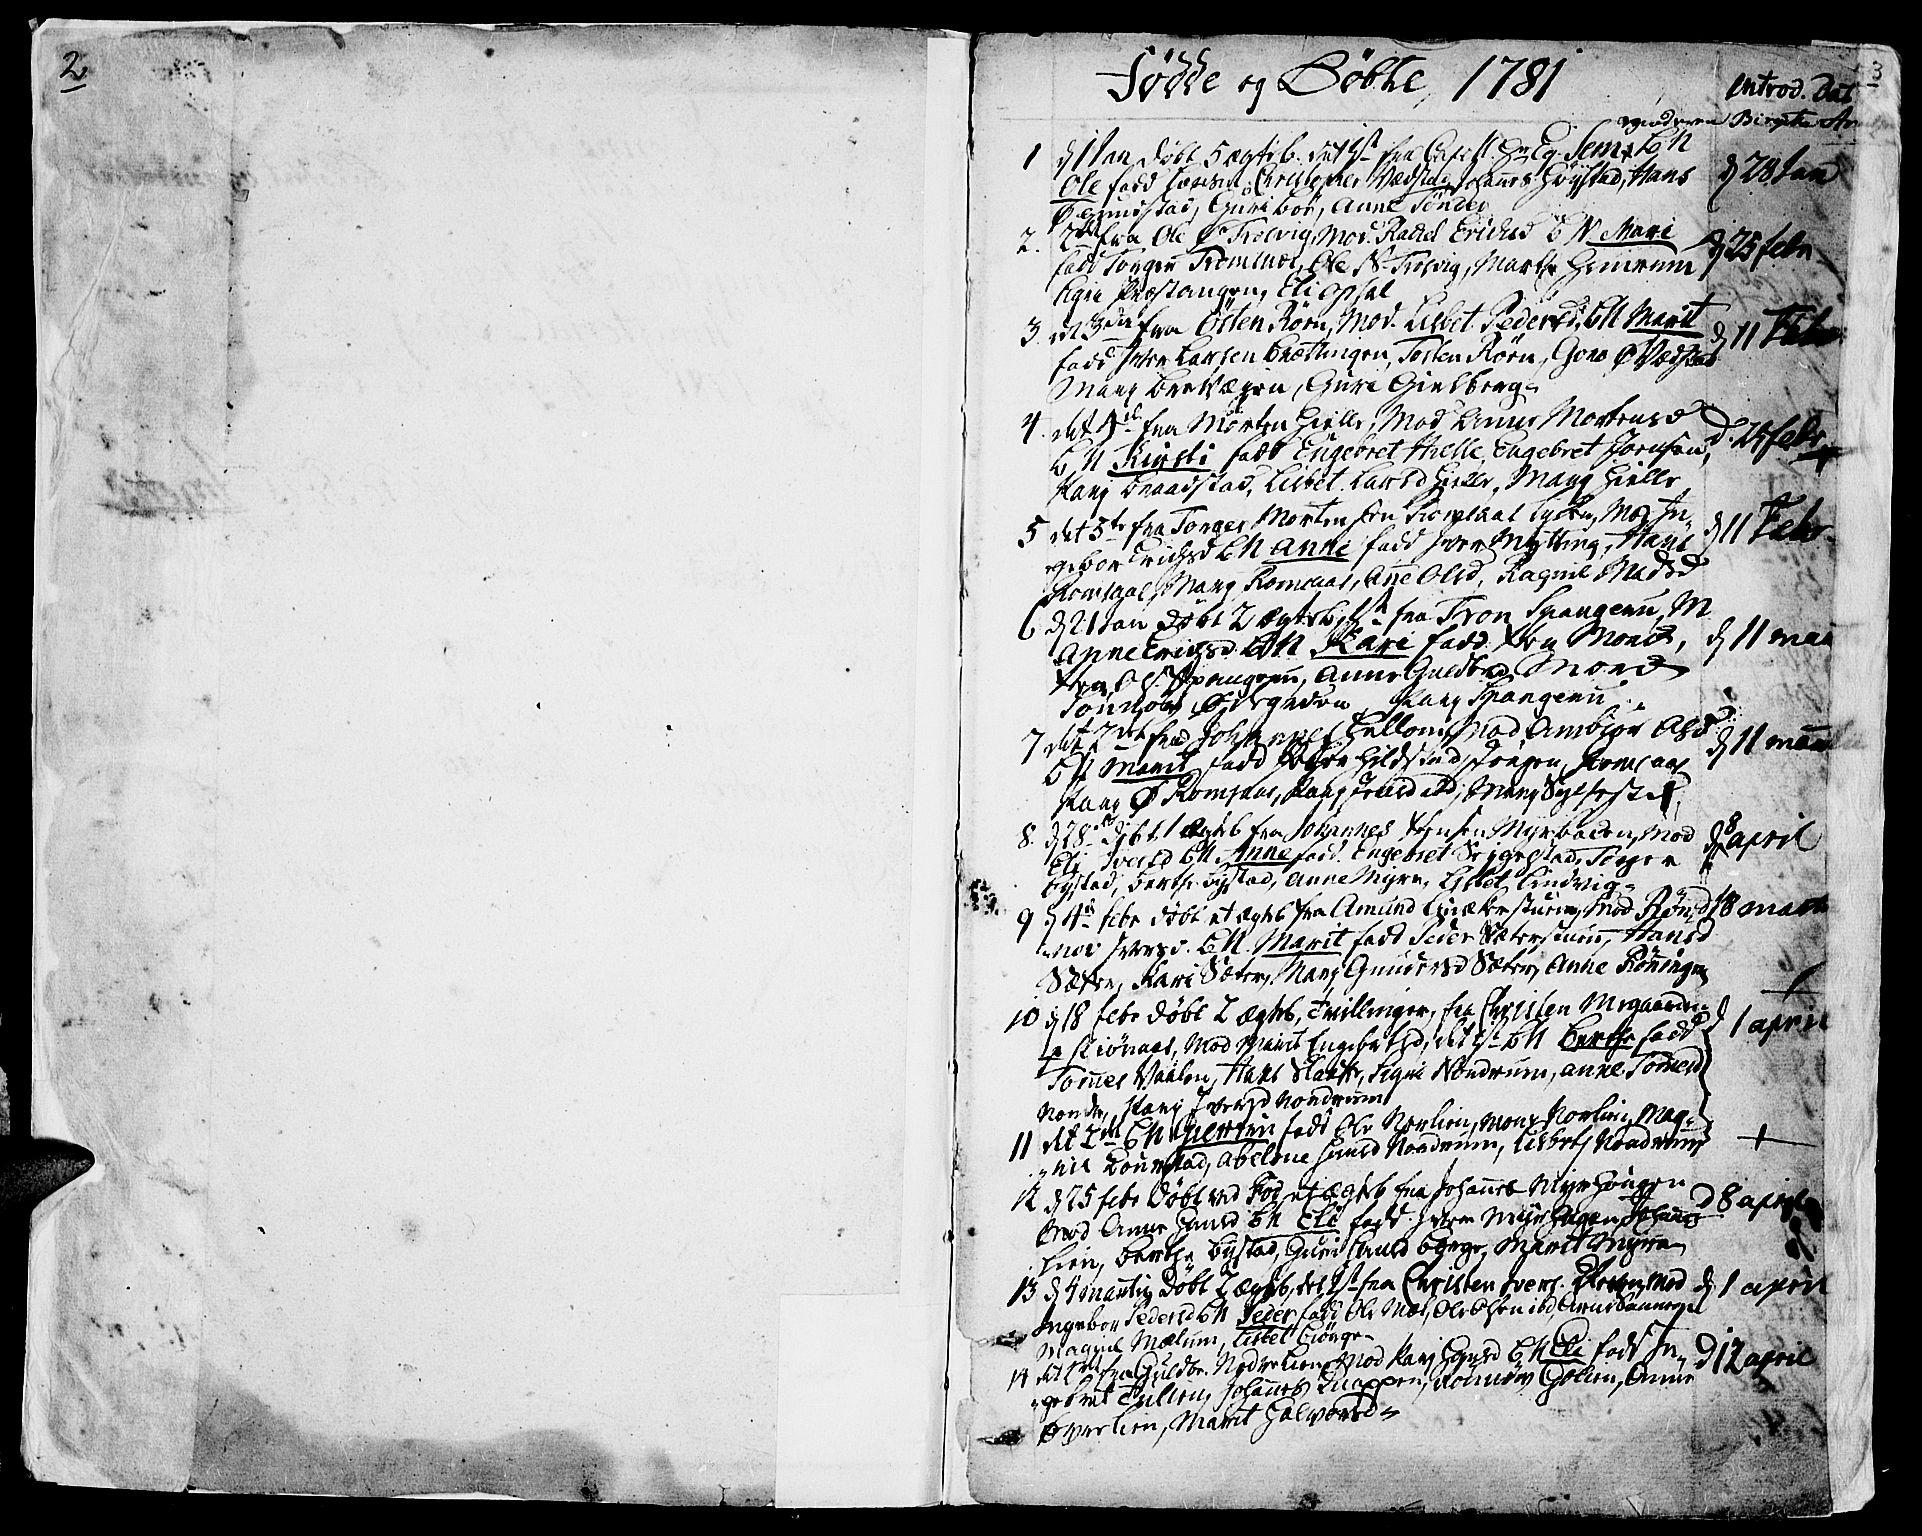 SAH, Ringebu prestekontor, Ministerialbok nr. 3, 1781-1820, s. 2-3